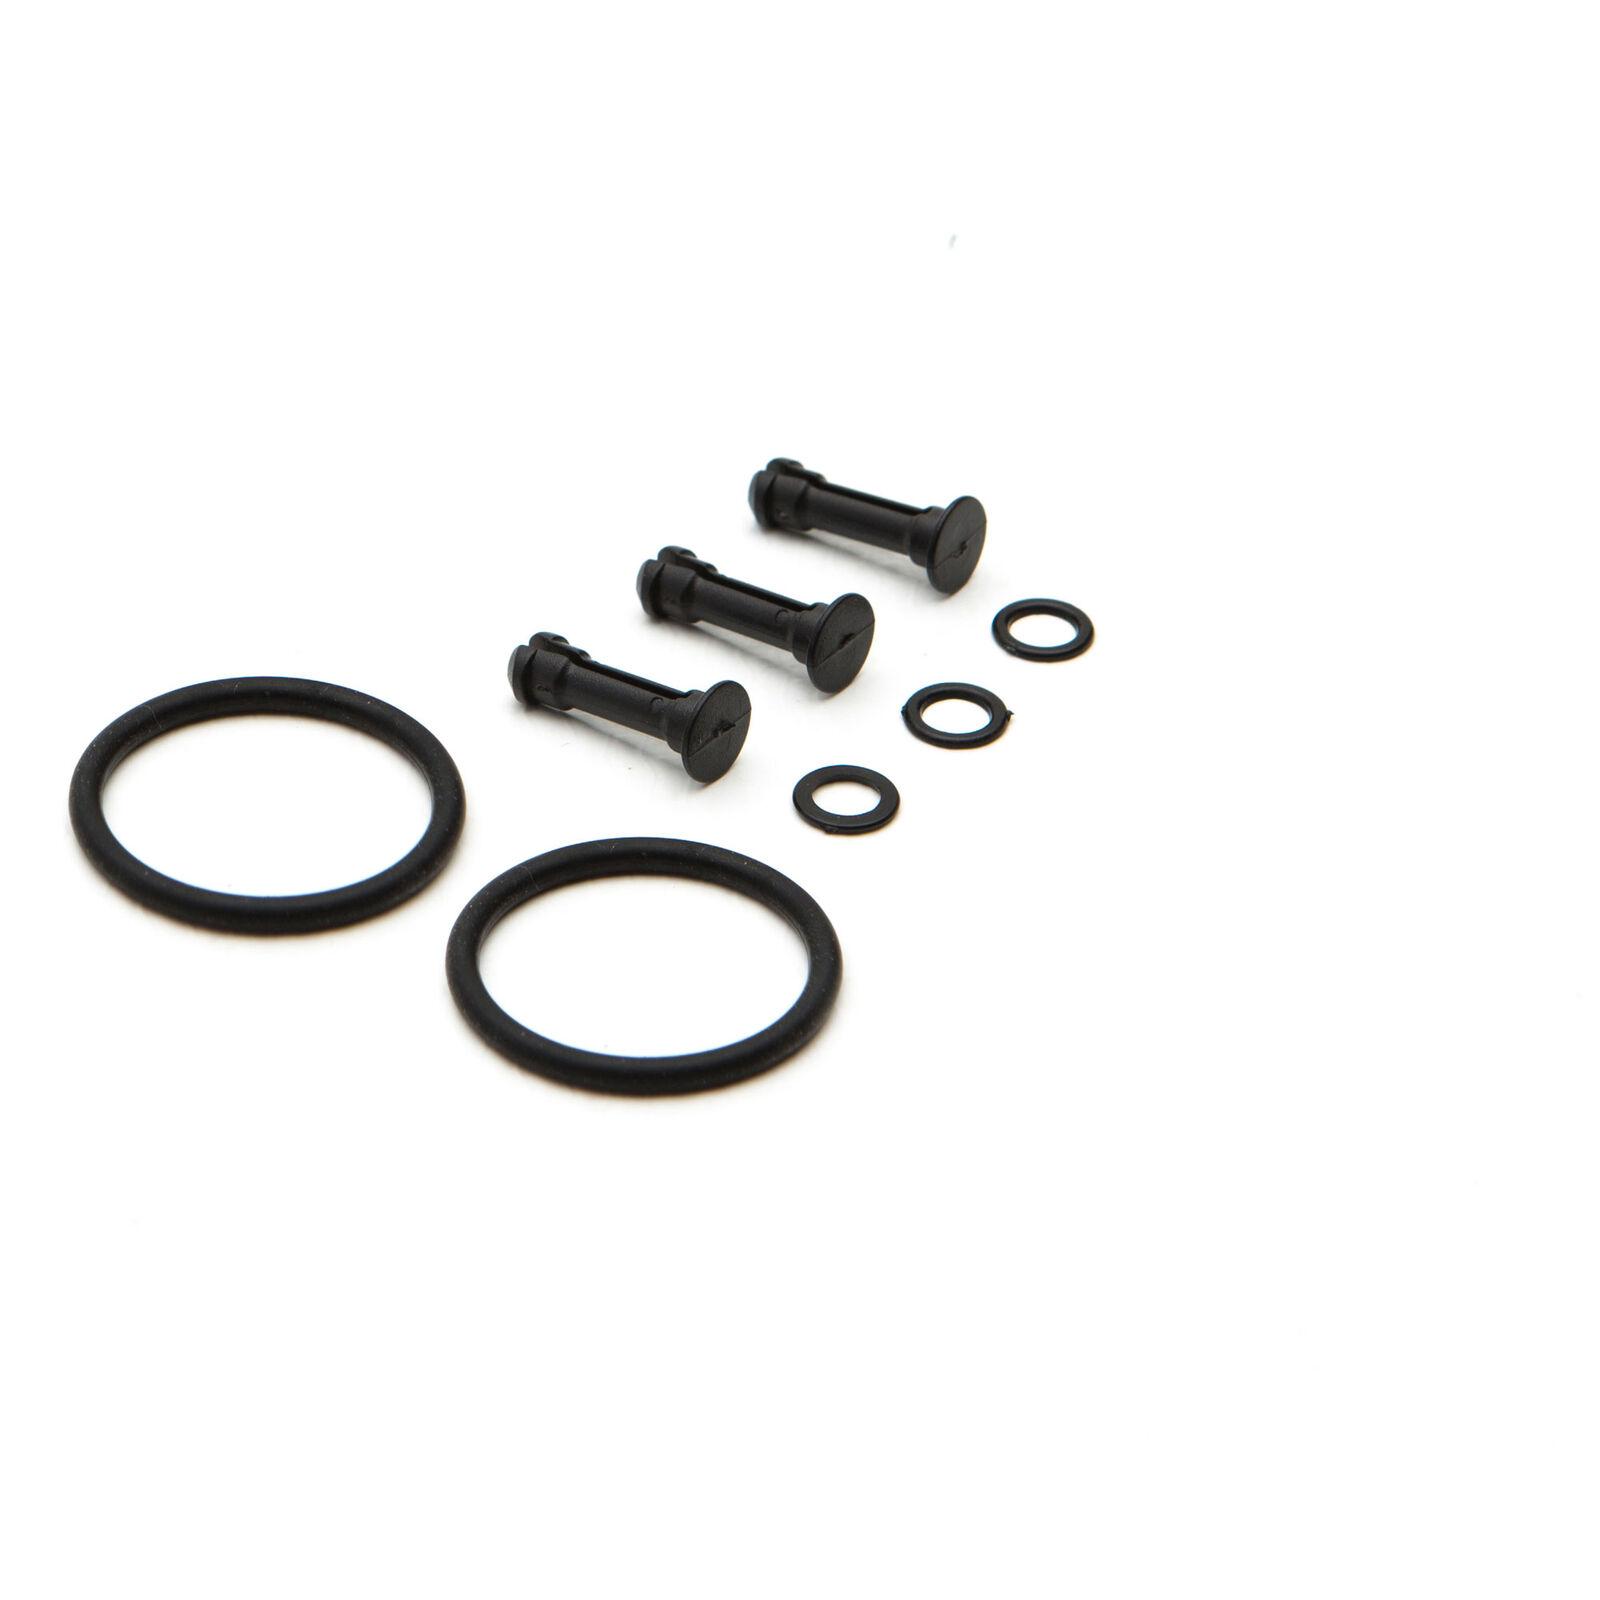 Battery Holder O-ring: Mach 25 FPV